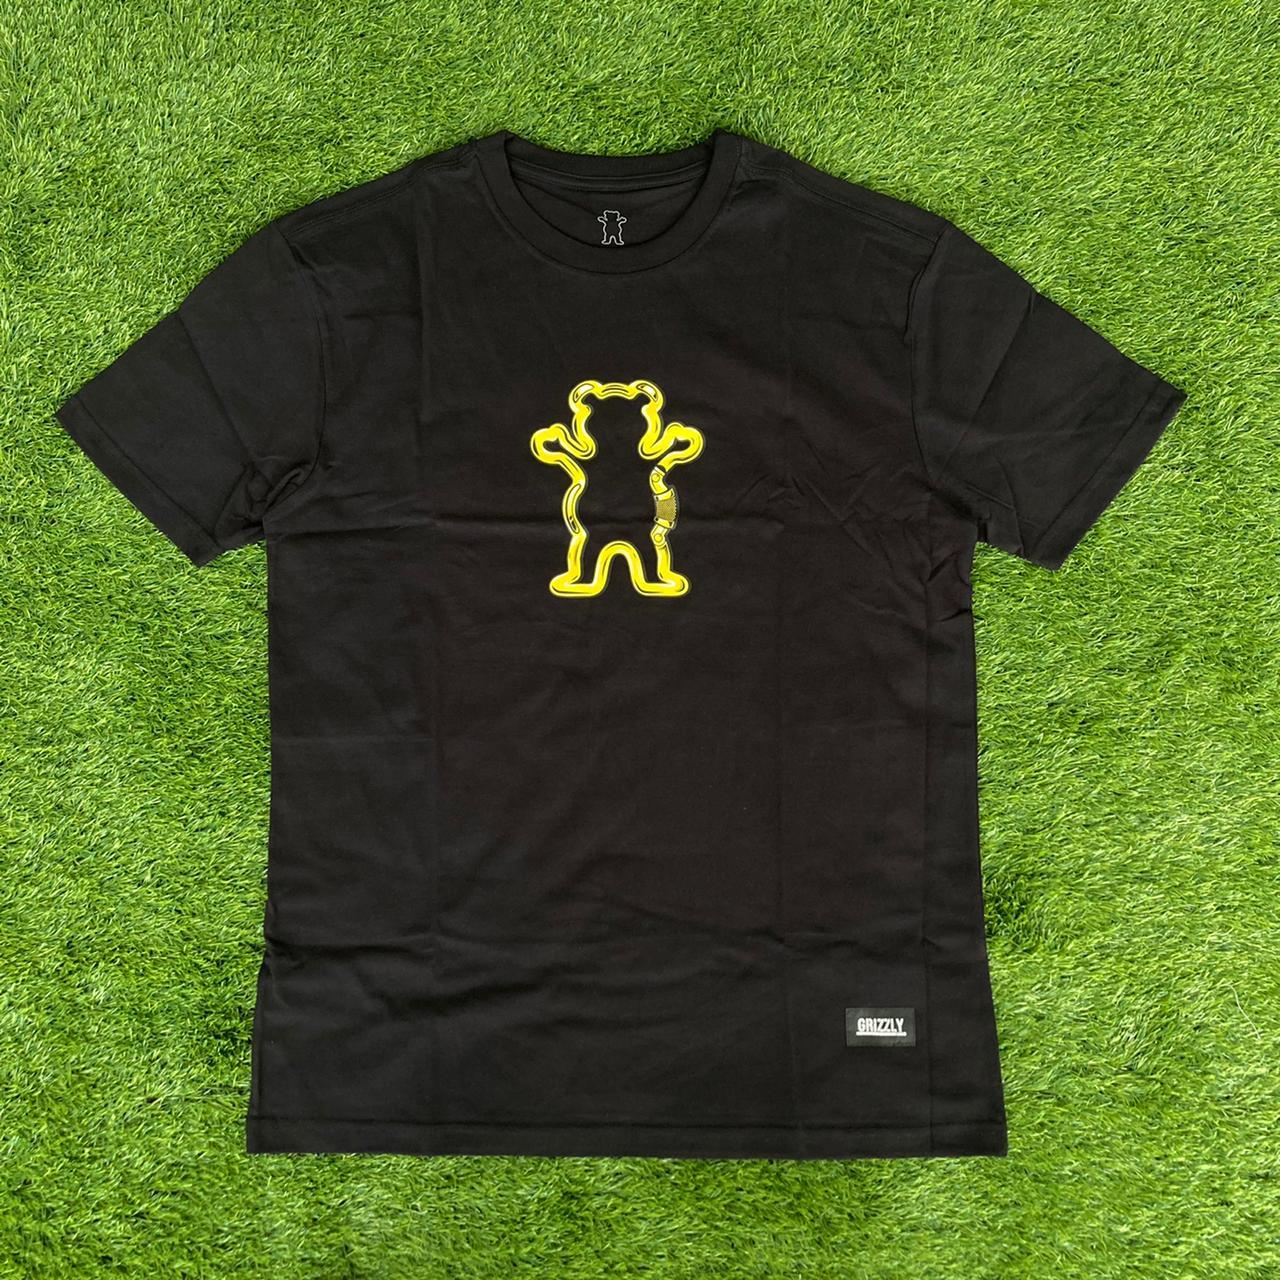 Camiseta grizzly carabiner black